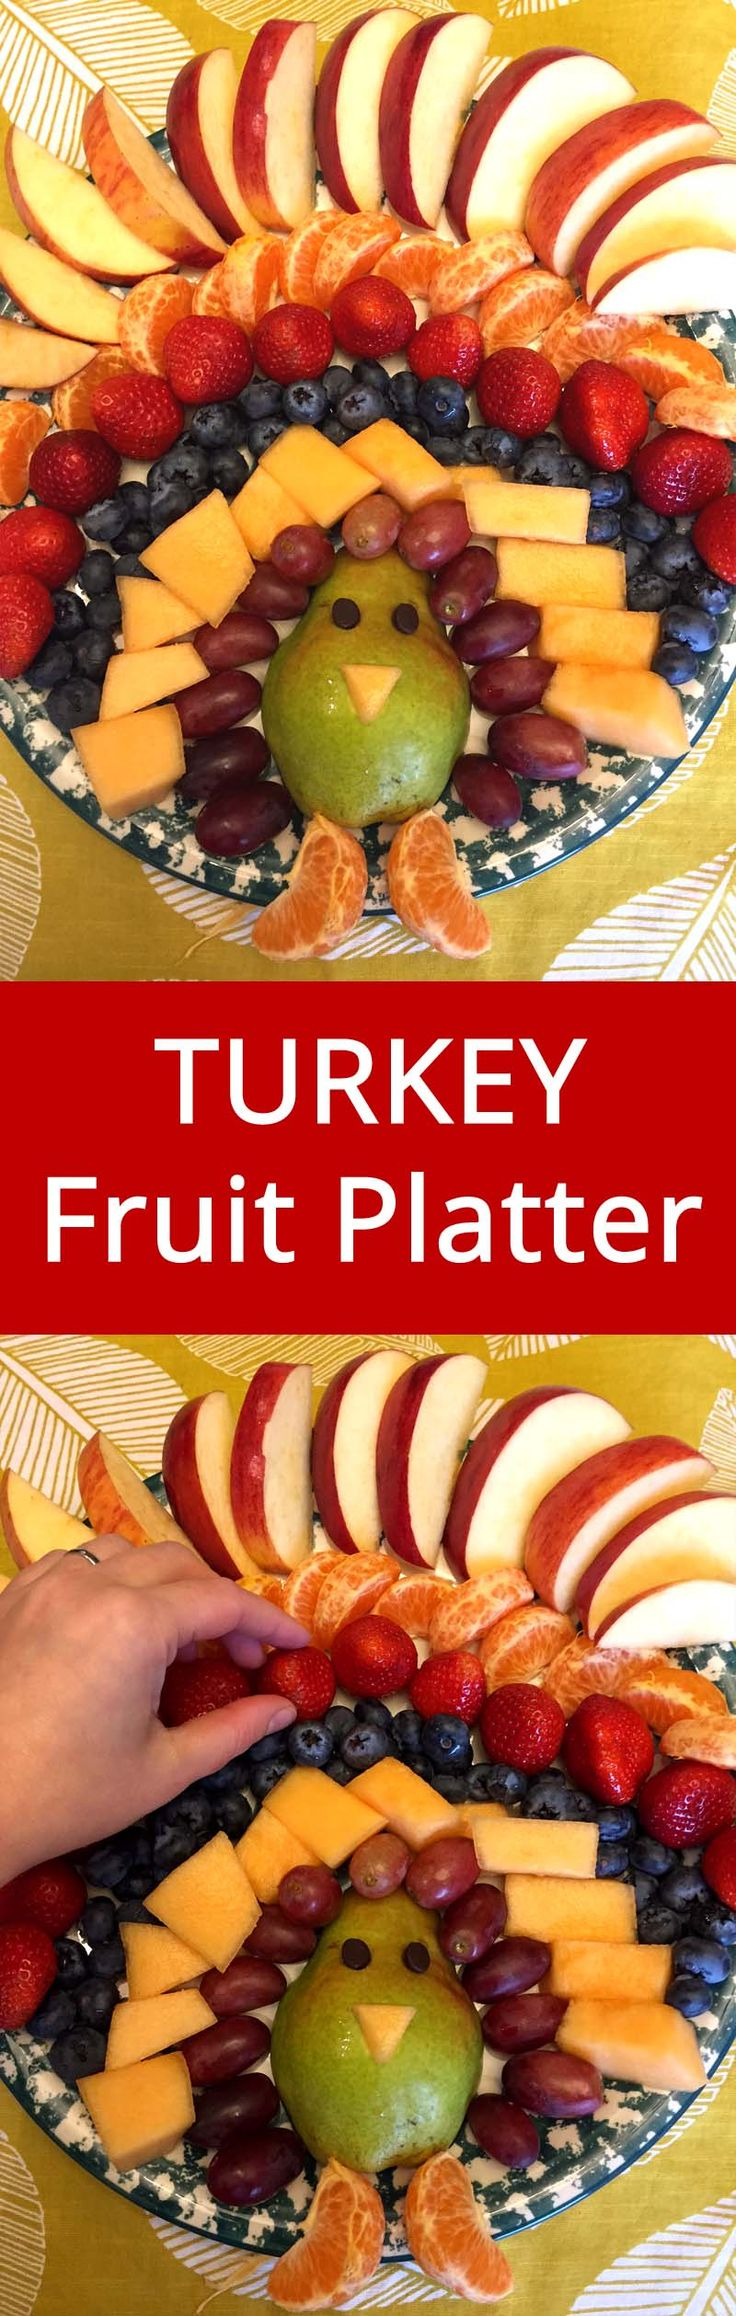 Turkey Fruit Platter :) Lots of AMAZING Thanksgiving recipes on this site! | MelanieCooks.com